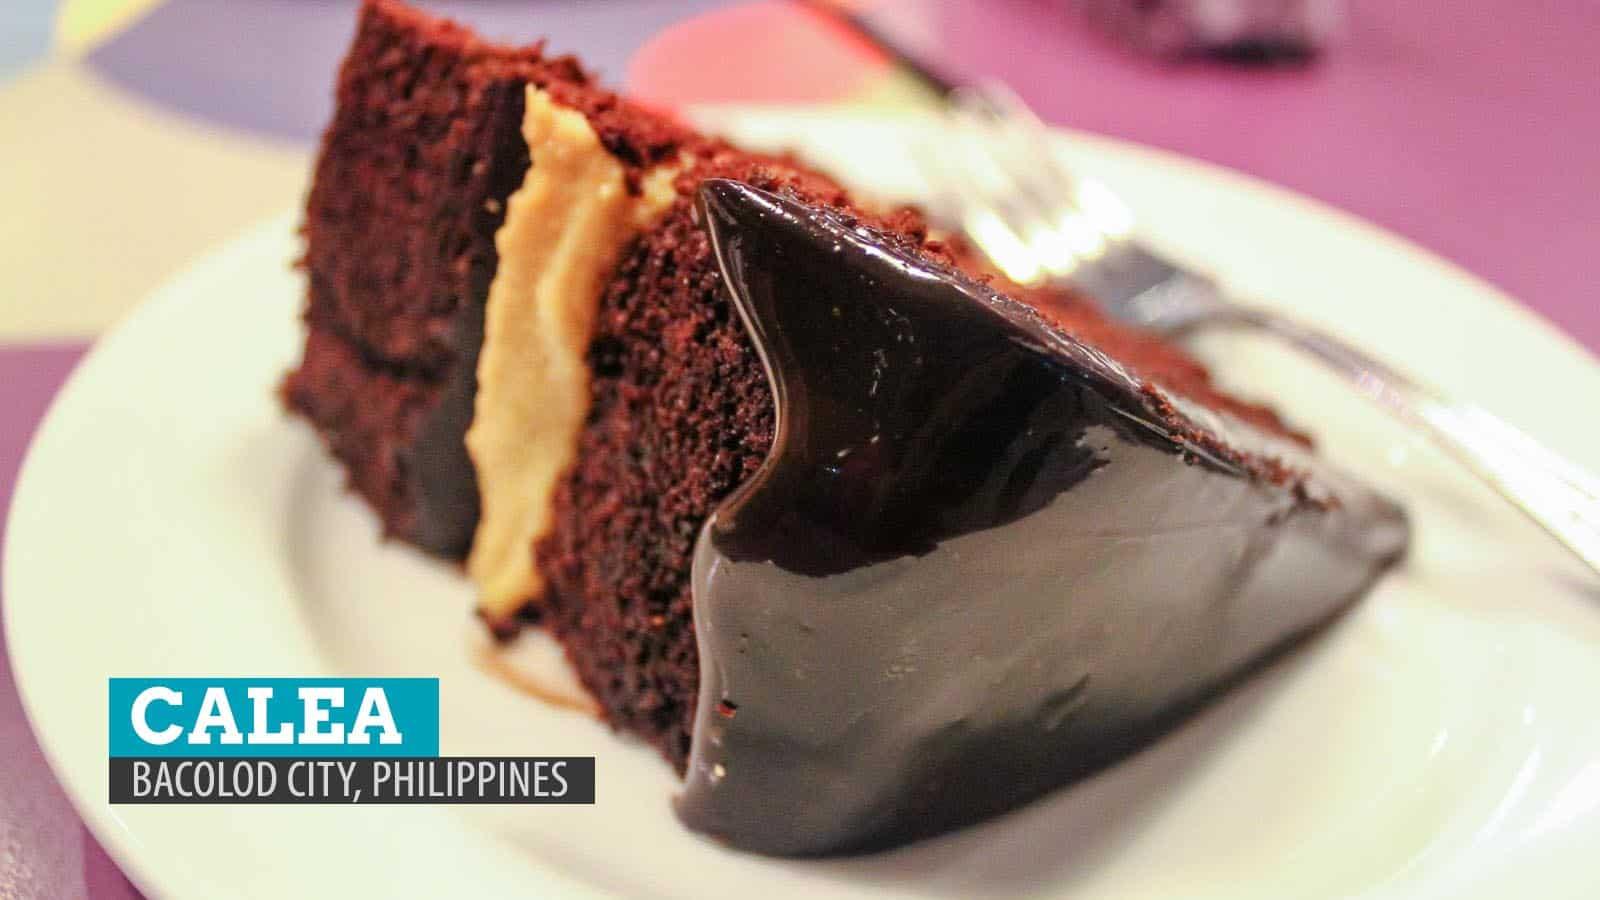 CALEA: Sugar Rush in Bacolod City, Philippines